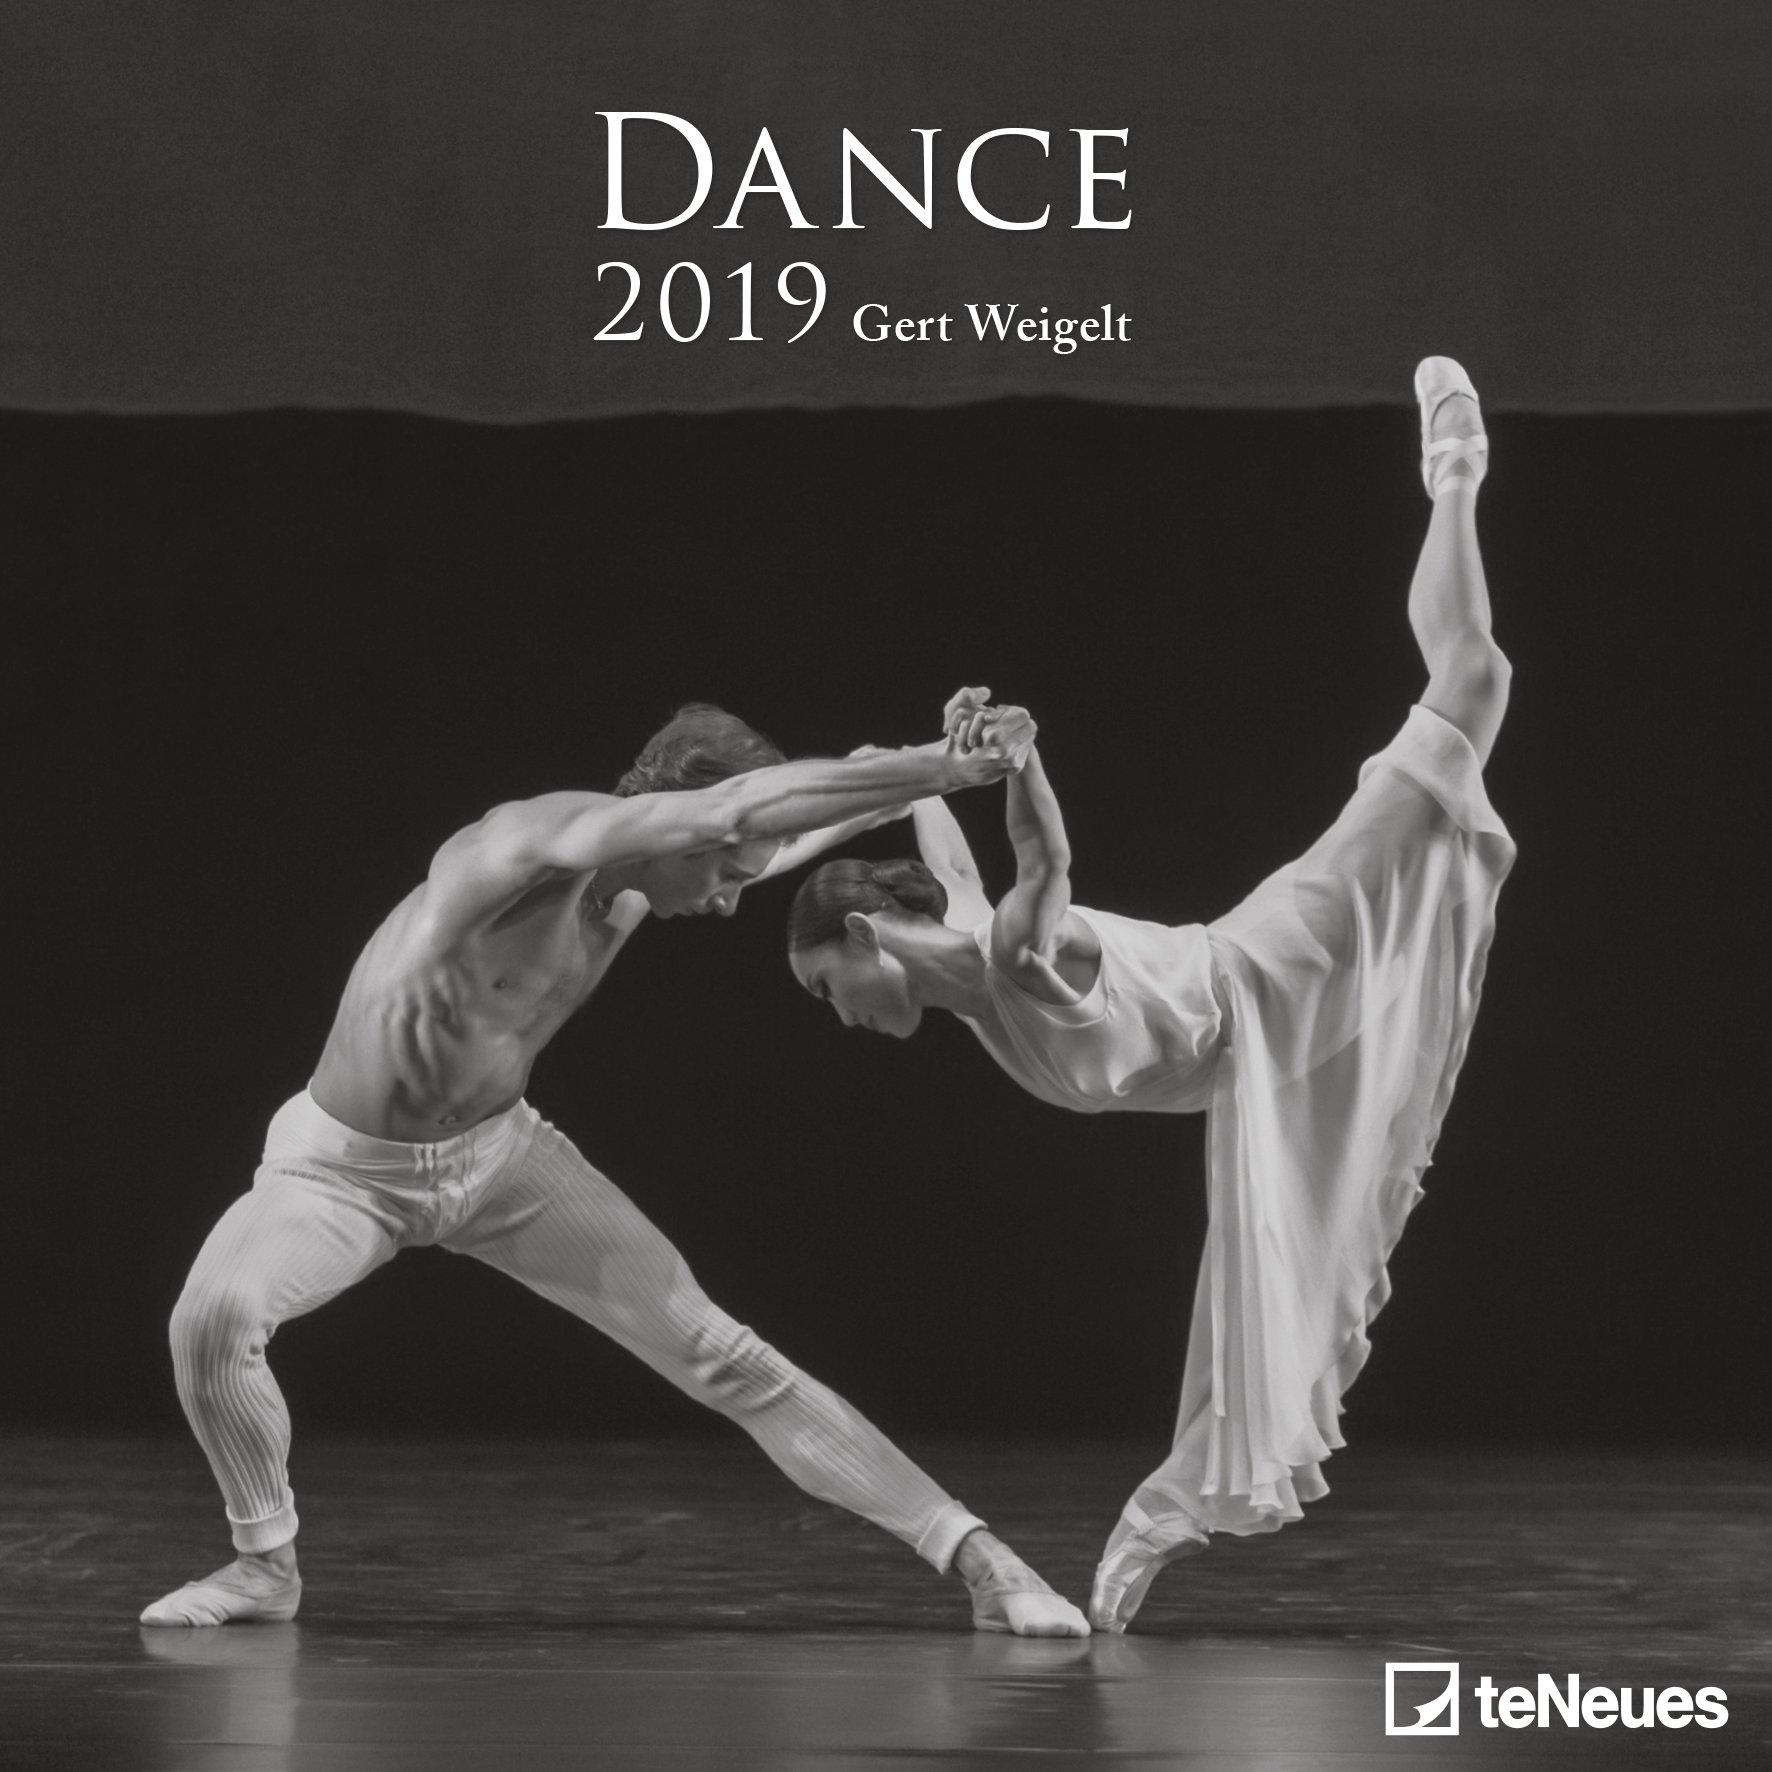 2019 dance calendar photography calendar 30 x 30 cm amazon co